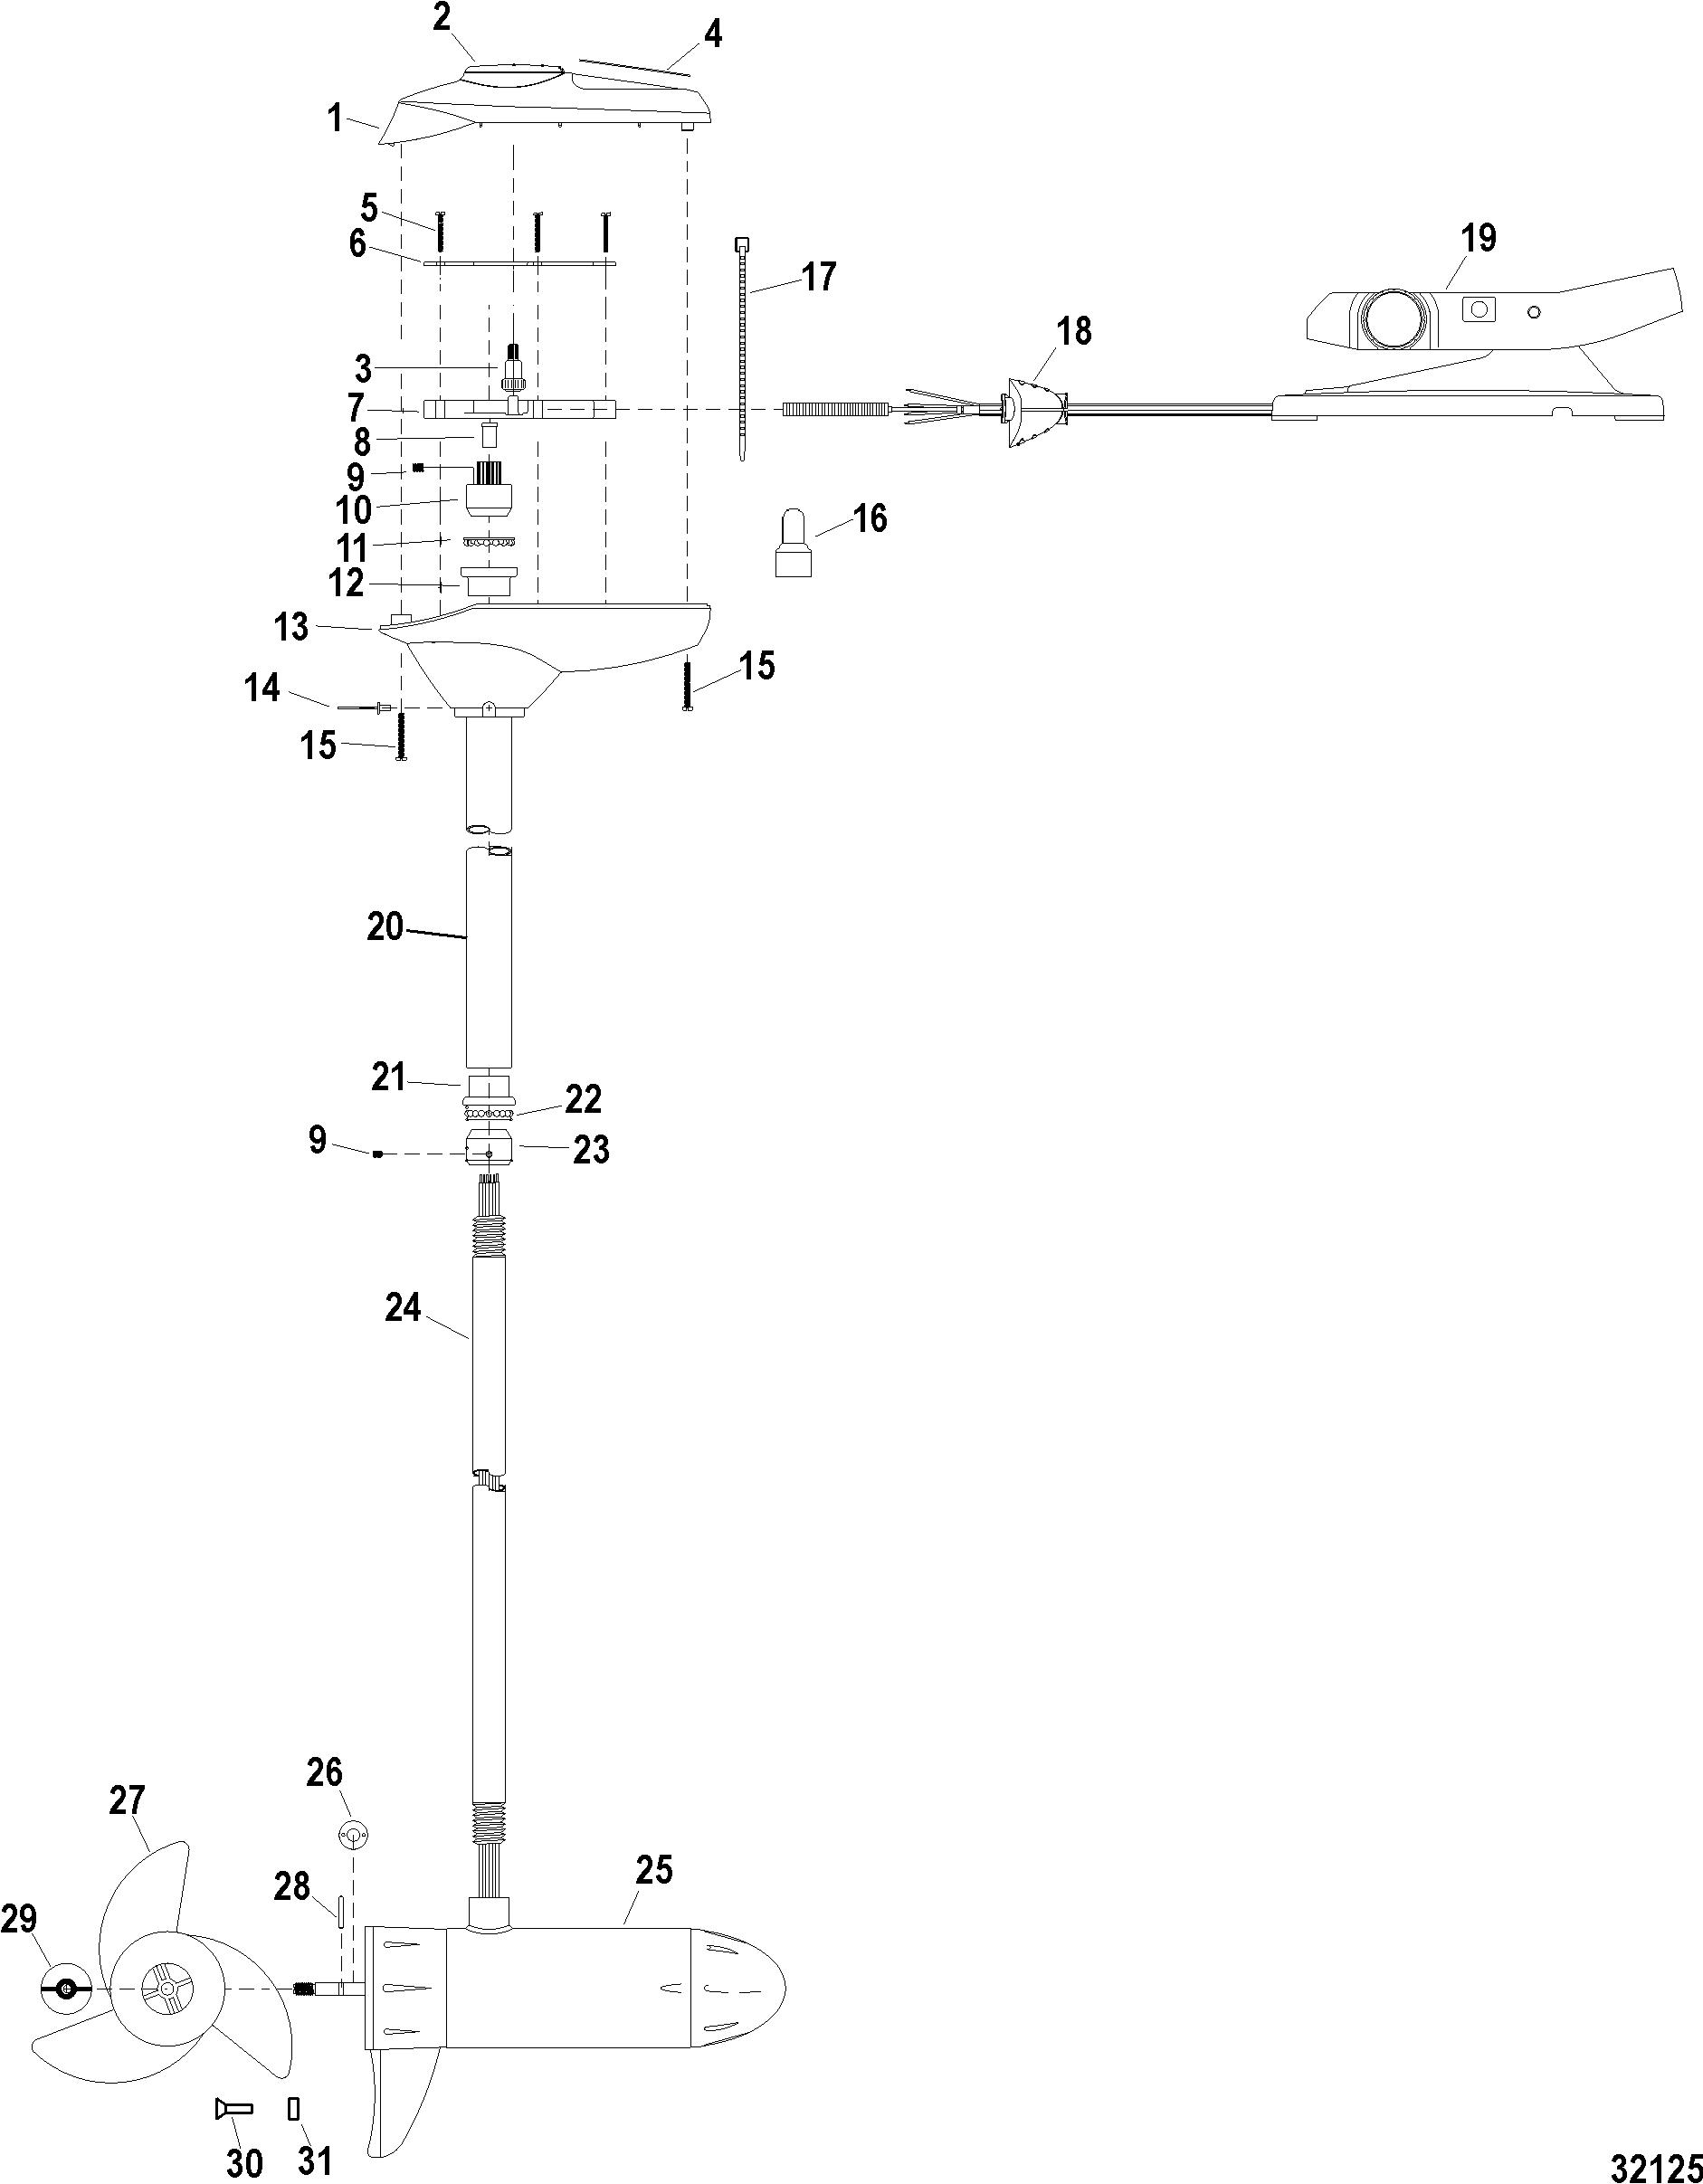 motorguide 24v wiring diagram motorguide image motorguide trolling motor wiring schematic motorguide auto on motorguide 24v wiring diagram